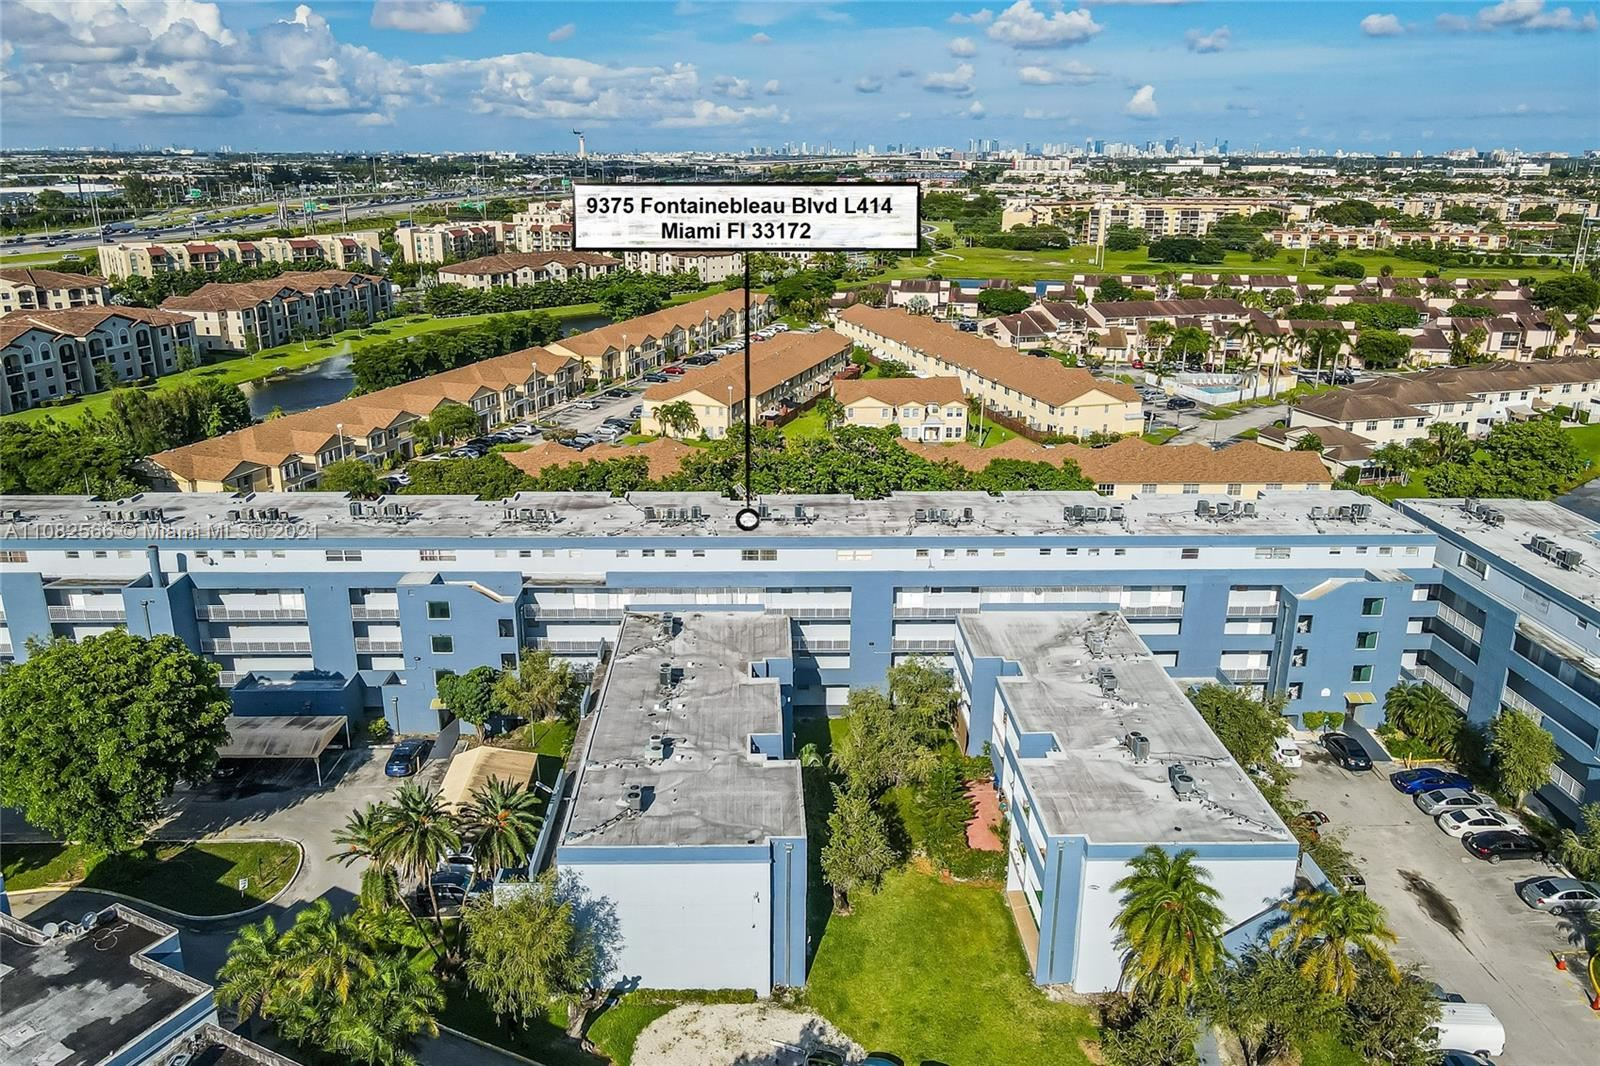 9375 Fontainebleau Blvd #L414, Miami, FL 33172 - #: A11082566